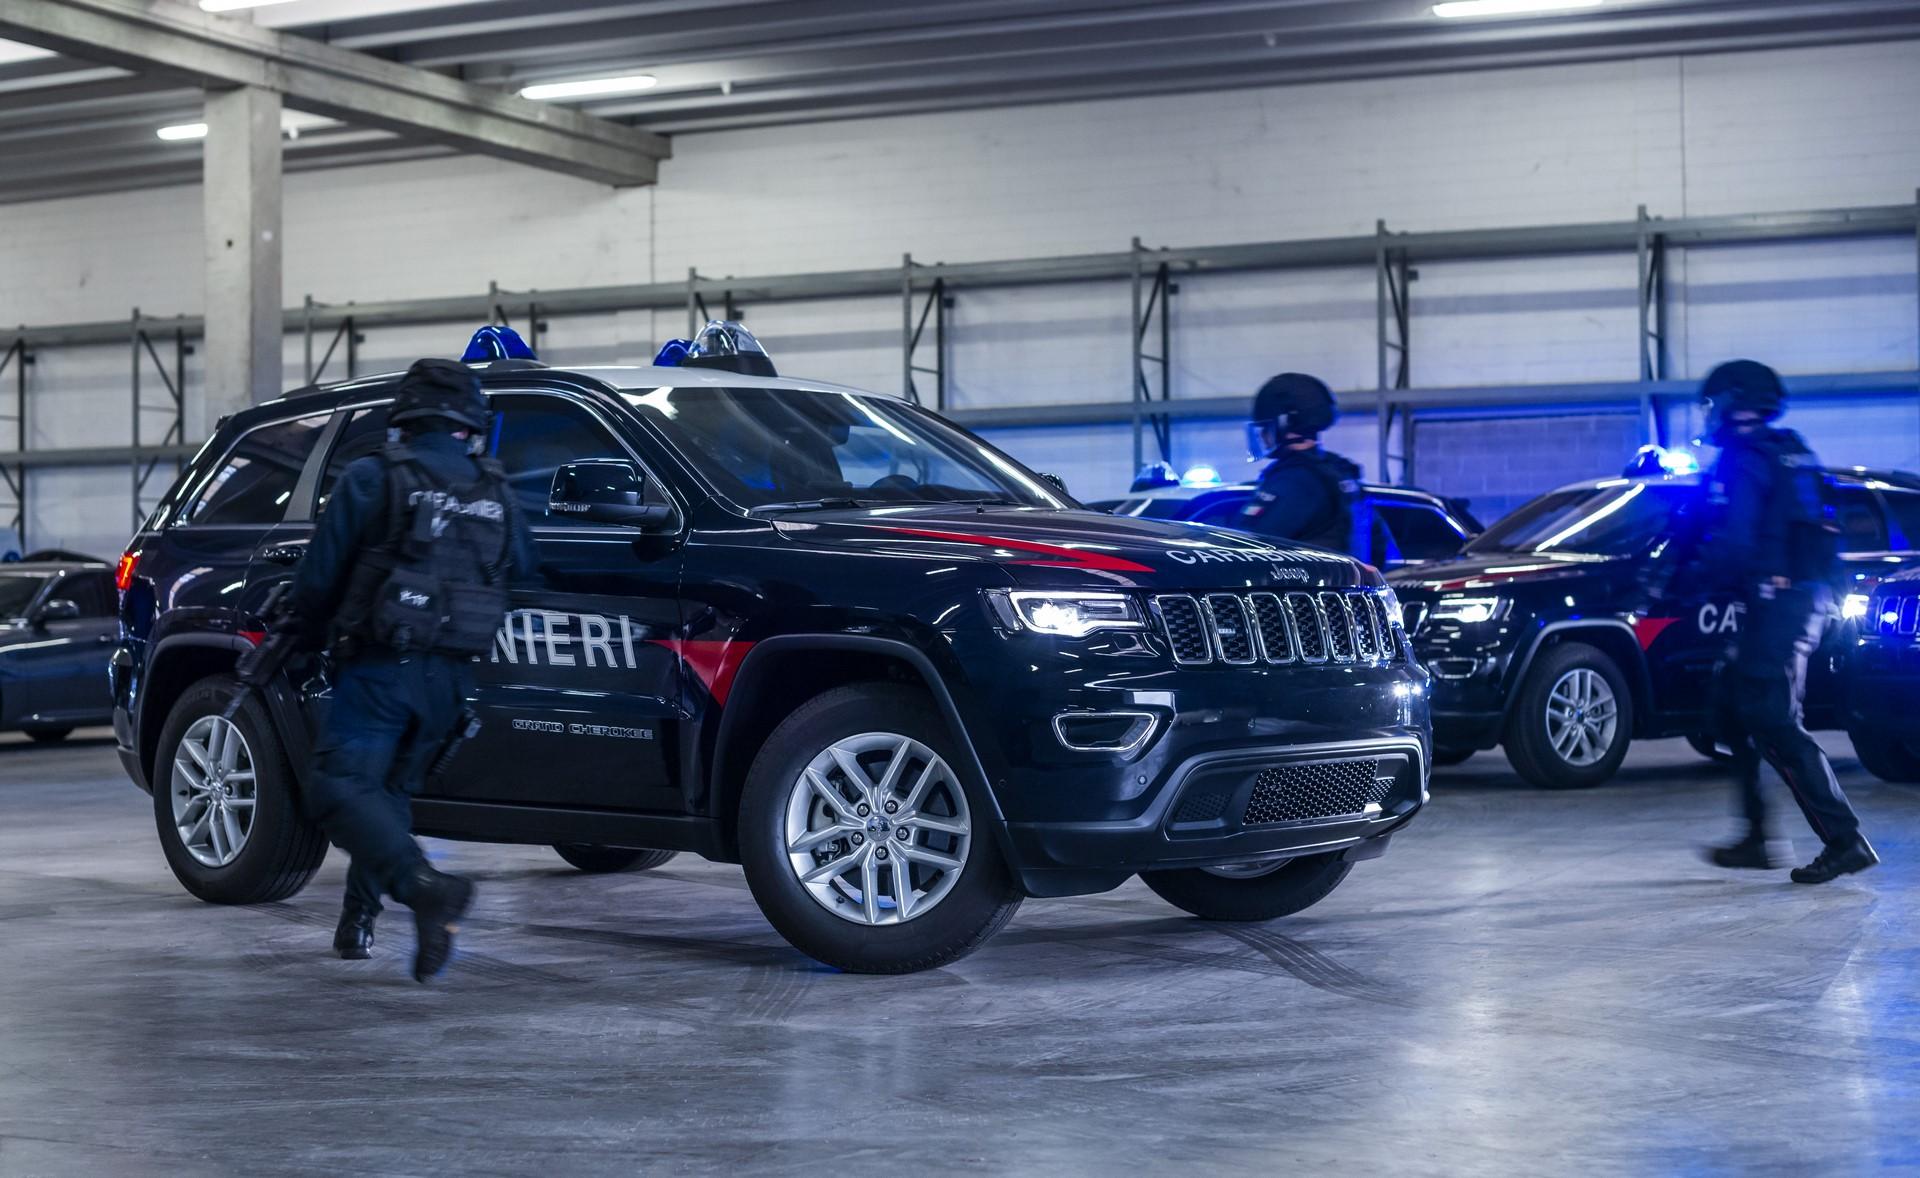 Jeep Grand Cherokee Carabinieri (1)